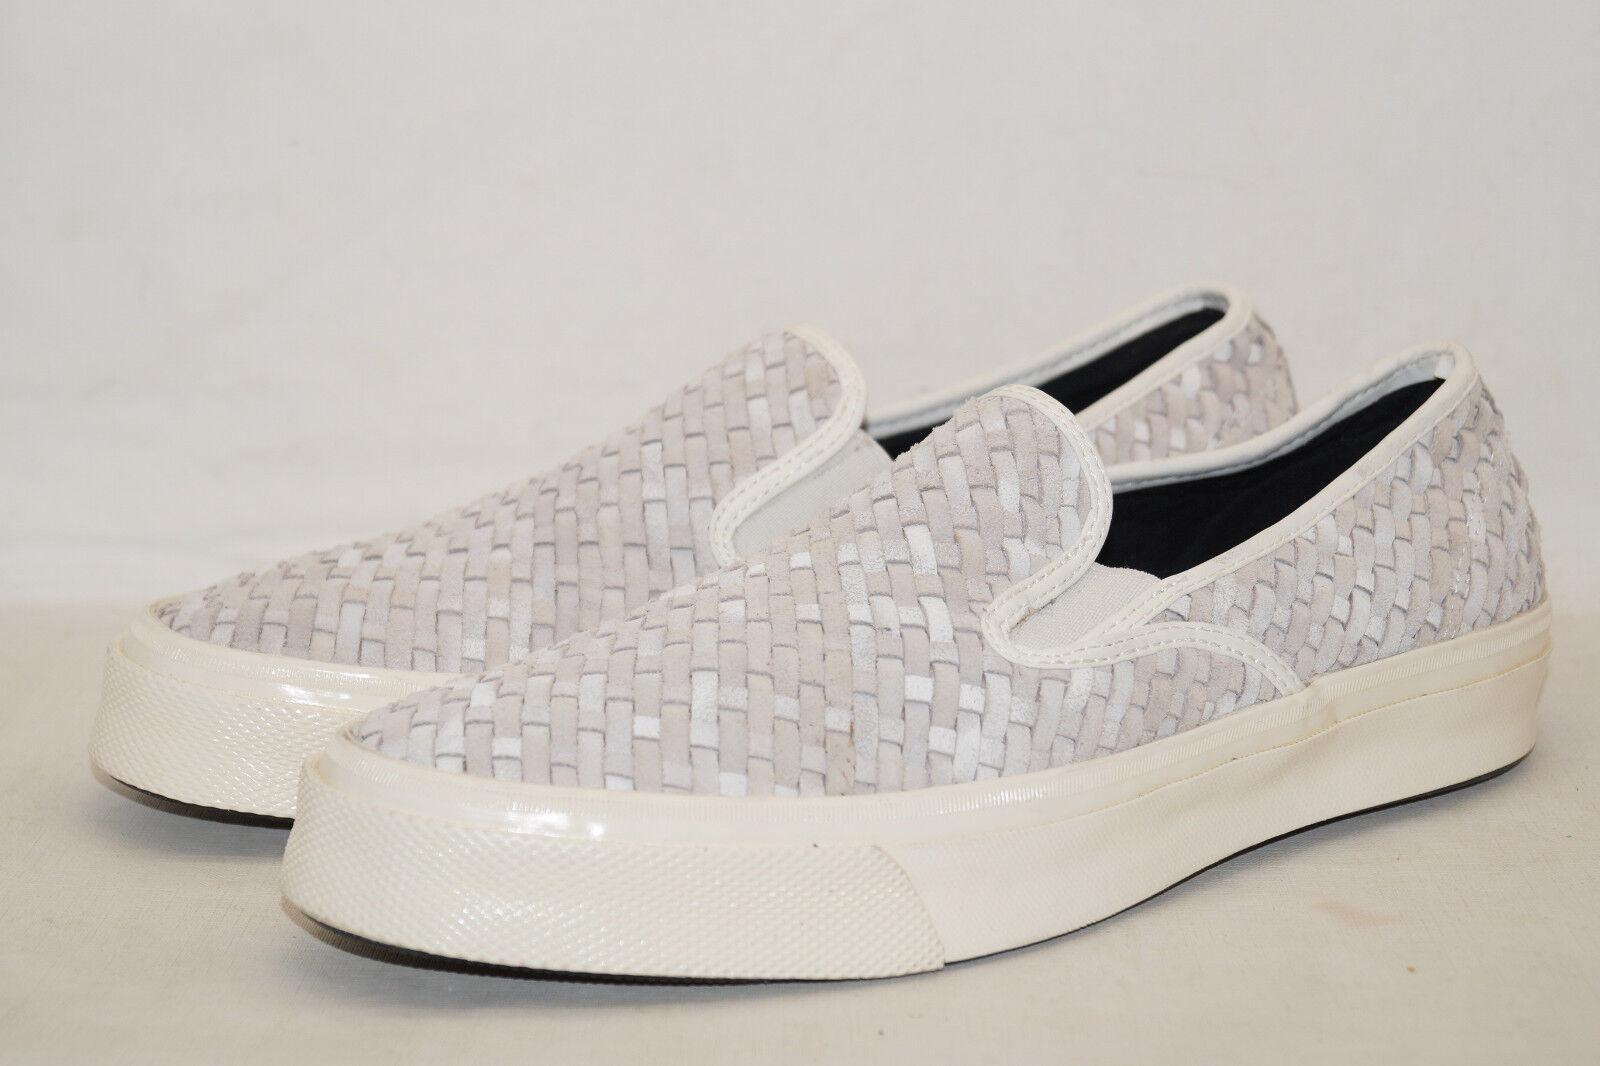 Converse Deck Star 67 Woven Sued weiss Slippers EU 43 UK 9 SAMPLES 151247      Moderater Preis